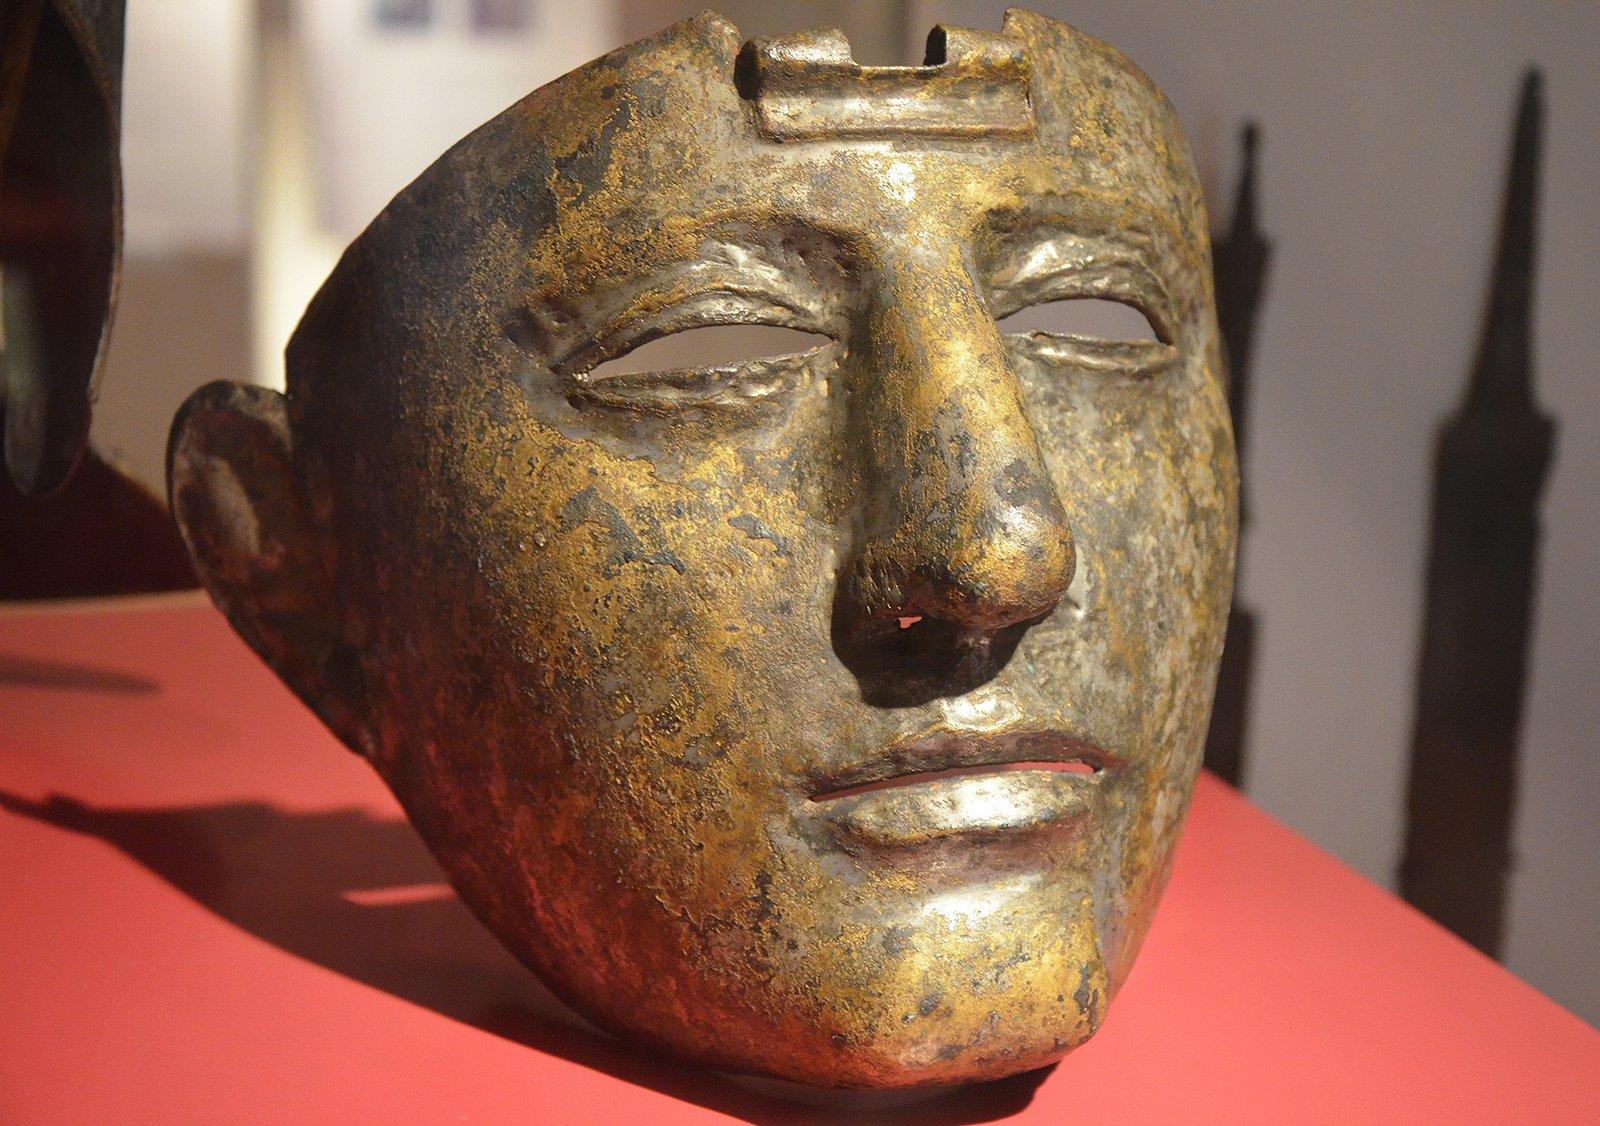 Cavalry Face-Mask Helmet (Illustration) - Ancient History